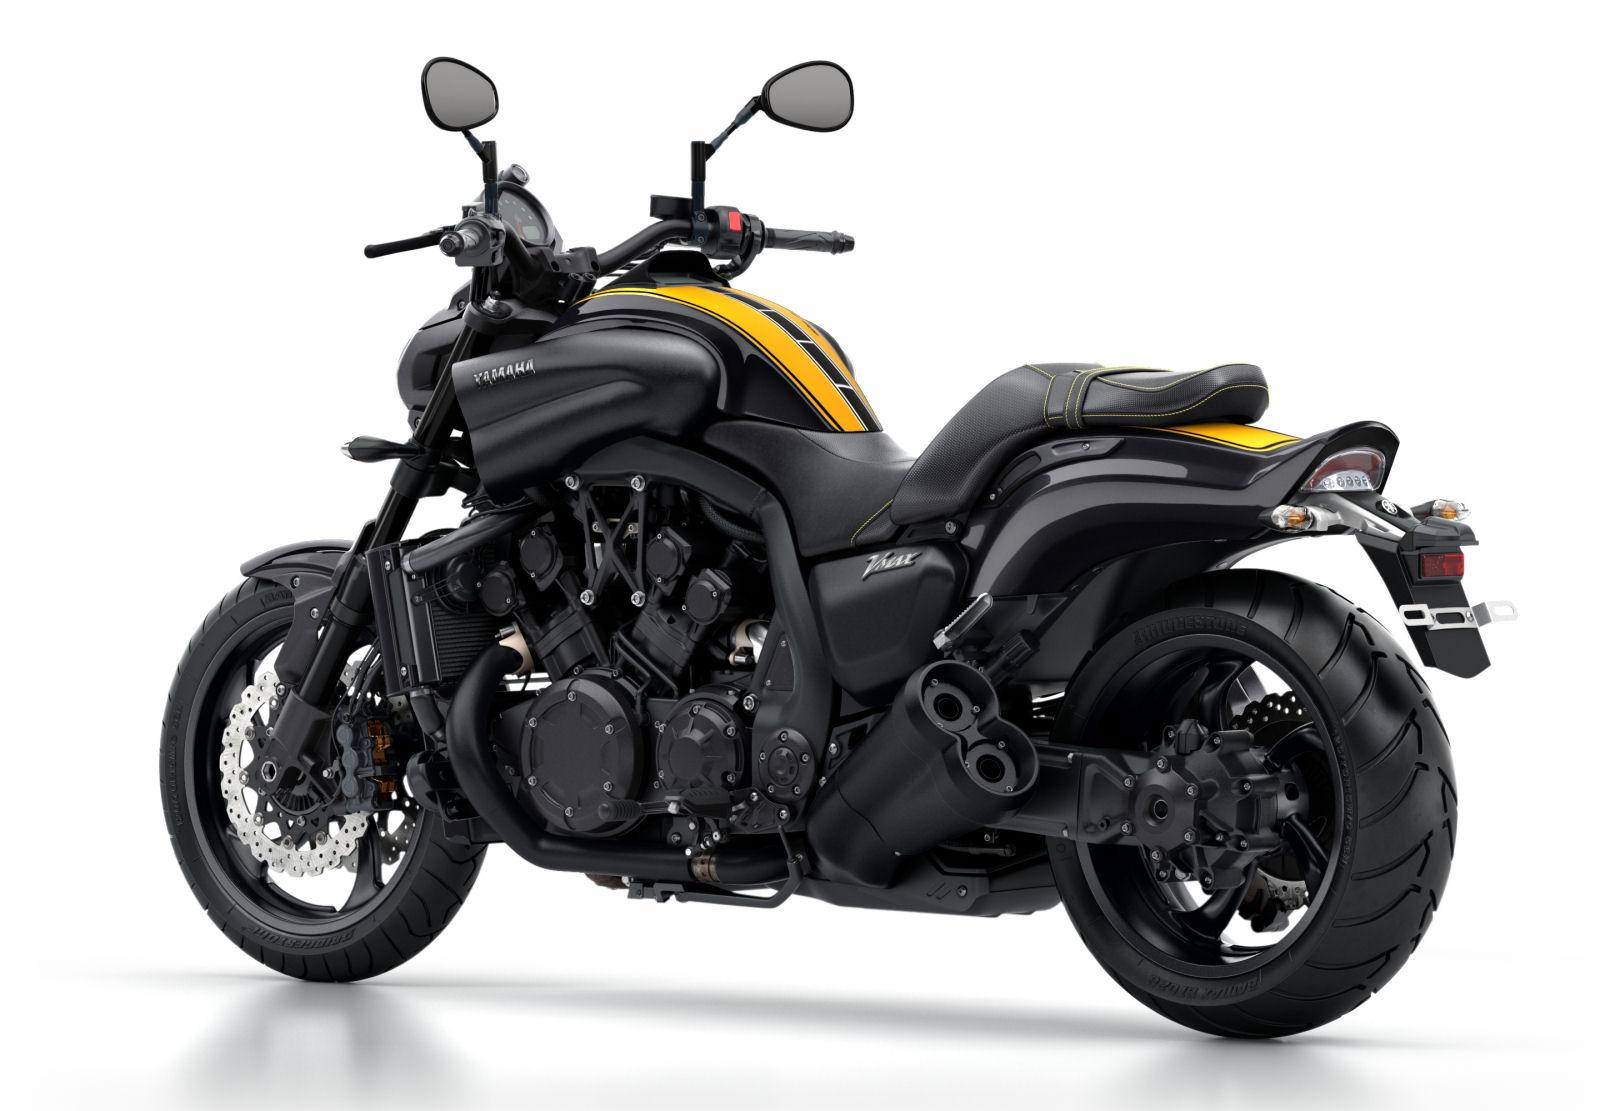 yamaha 1700 v max 60eme anniversaire 2016 galerie moto motoplanete. Black Bedroom Furniture Sets. Home Design Ideas